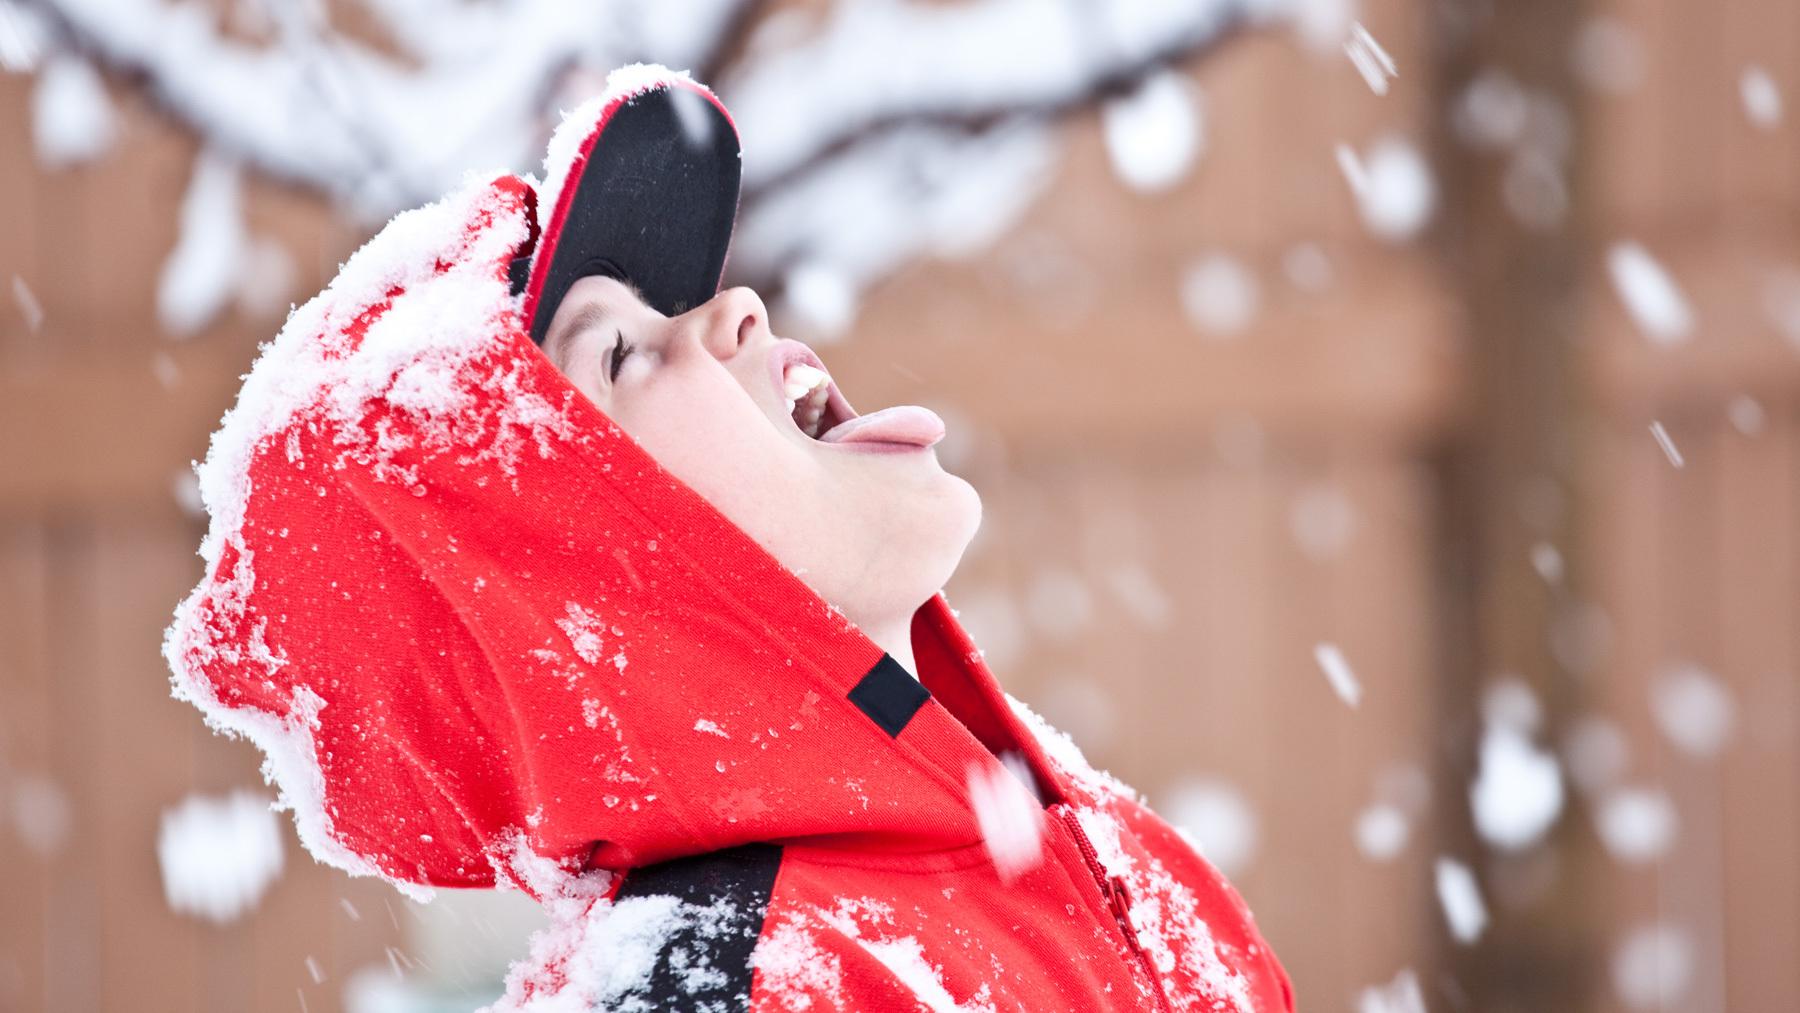 برف مصنوعی قابل مصرف خوراکی